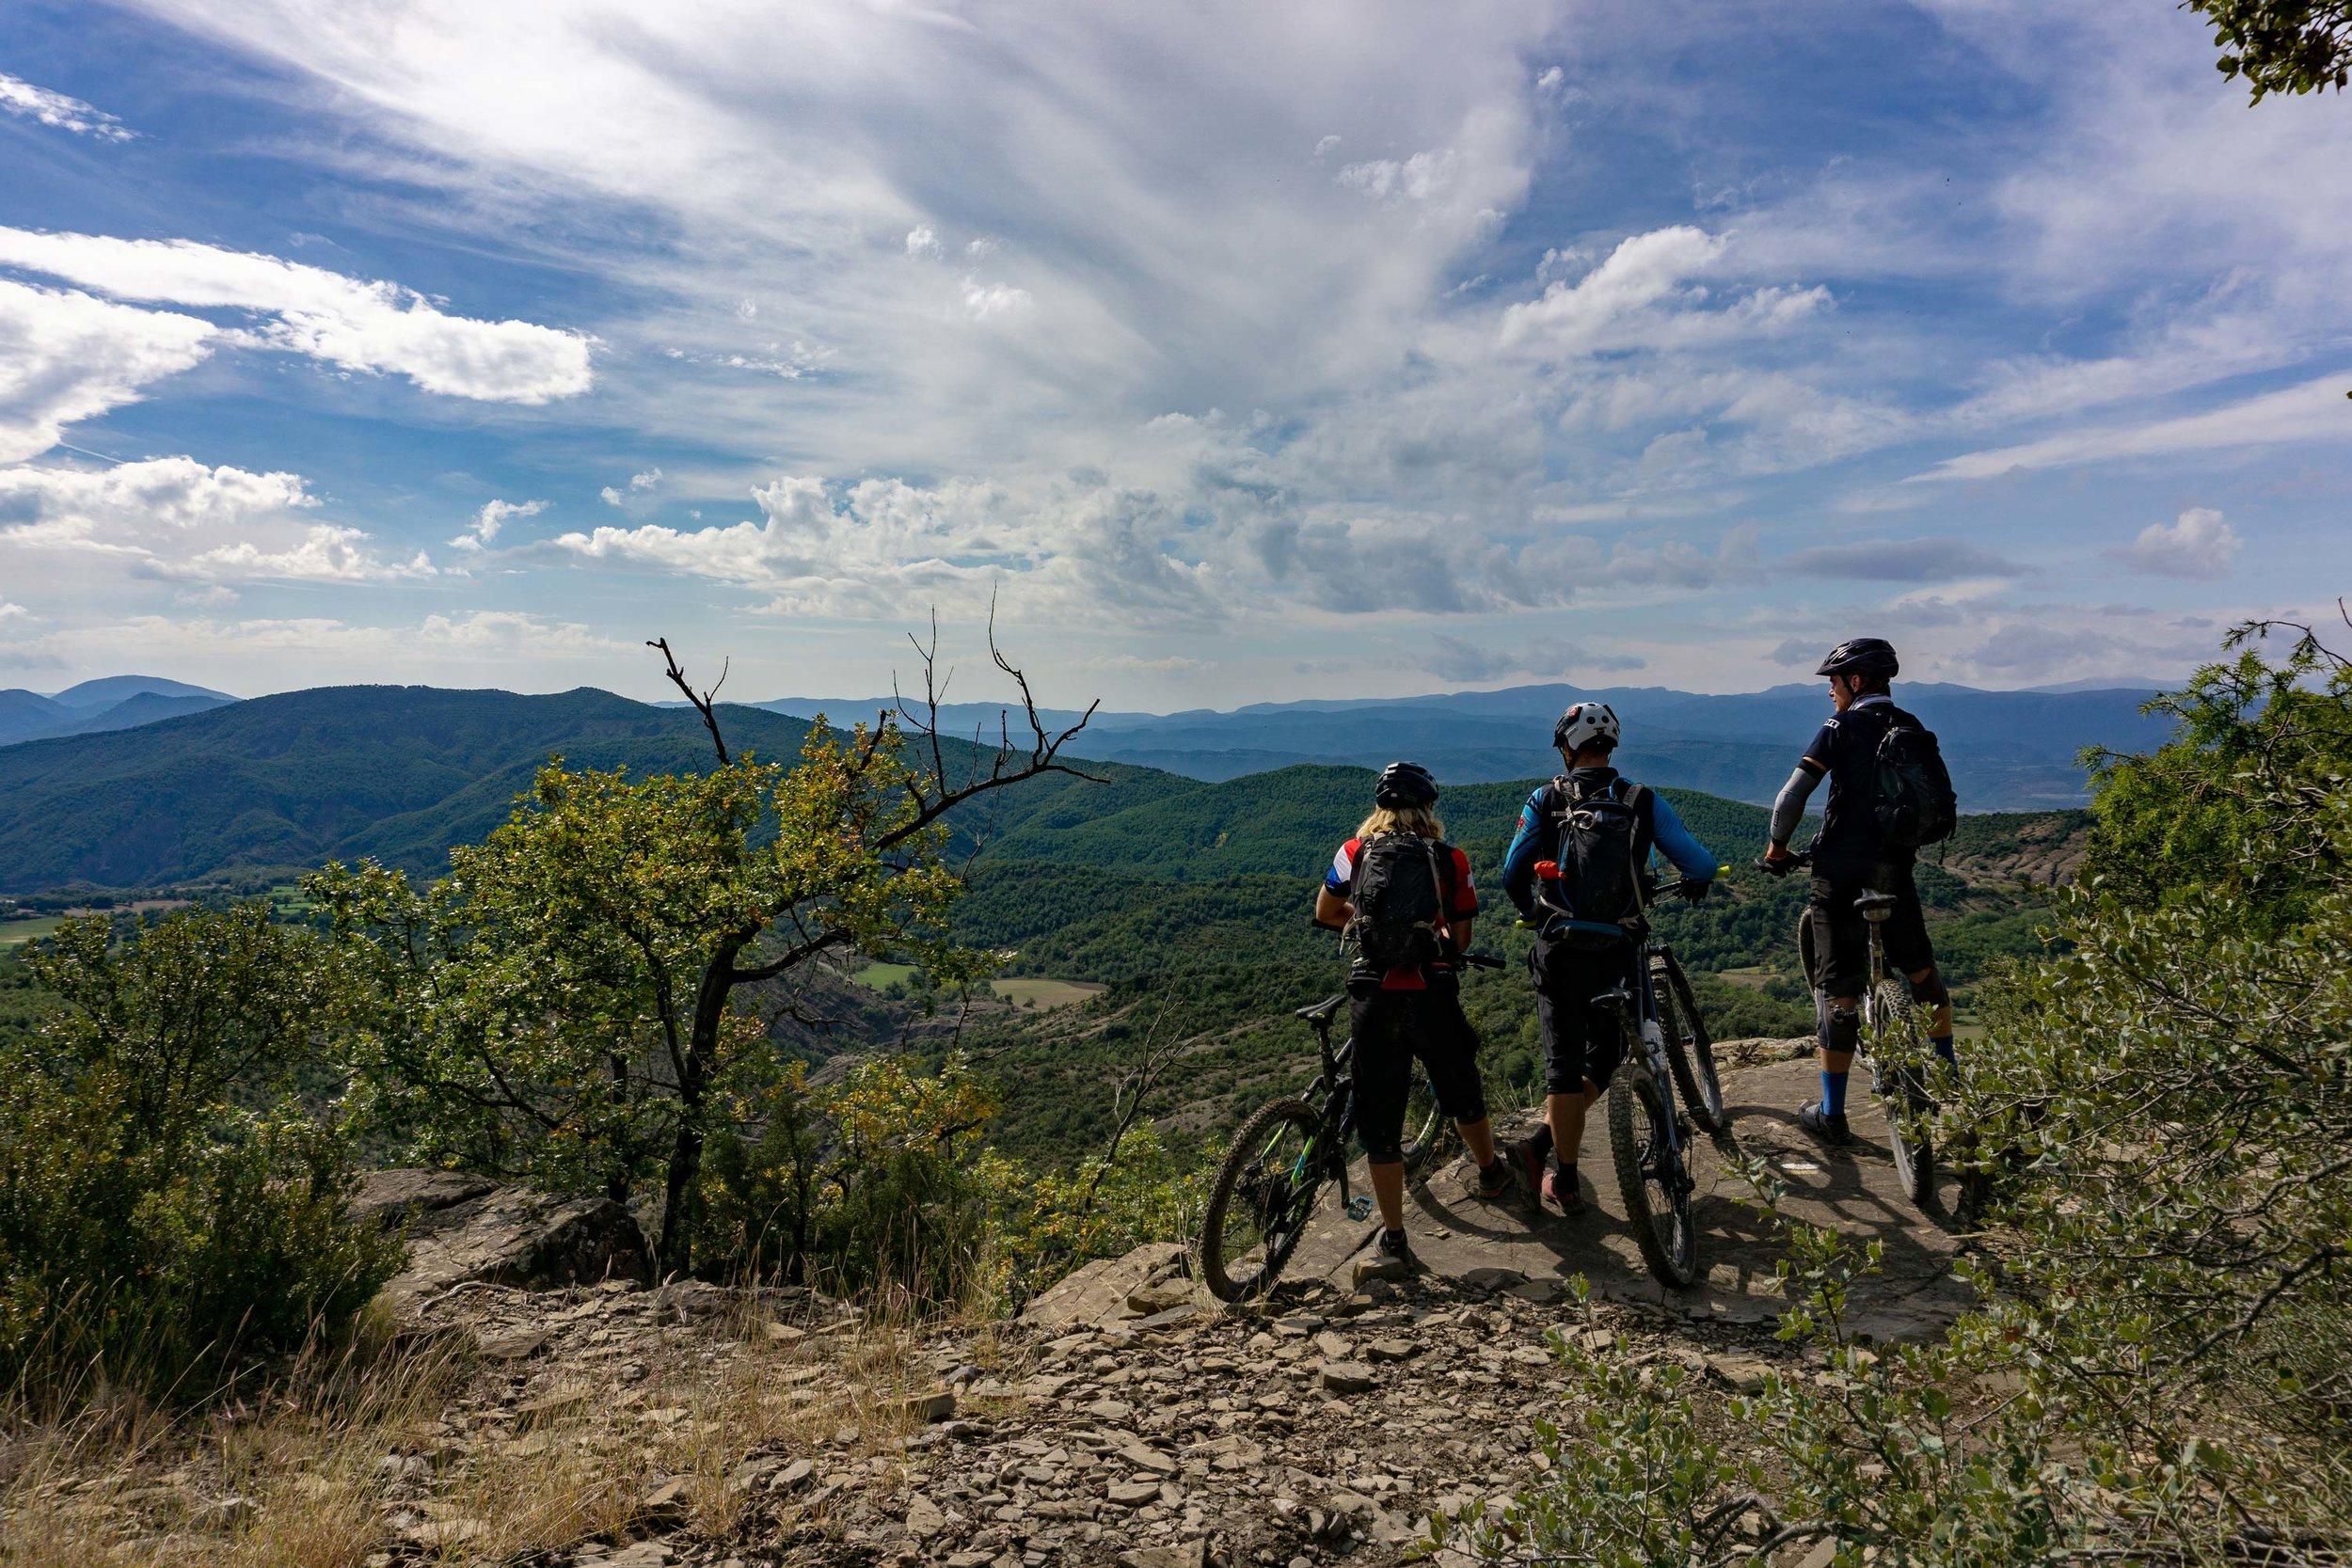 Arno, Wouter & Jeroen enjoying the views on the Bajo Peñas trails